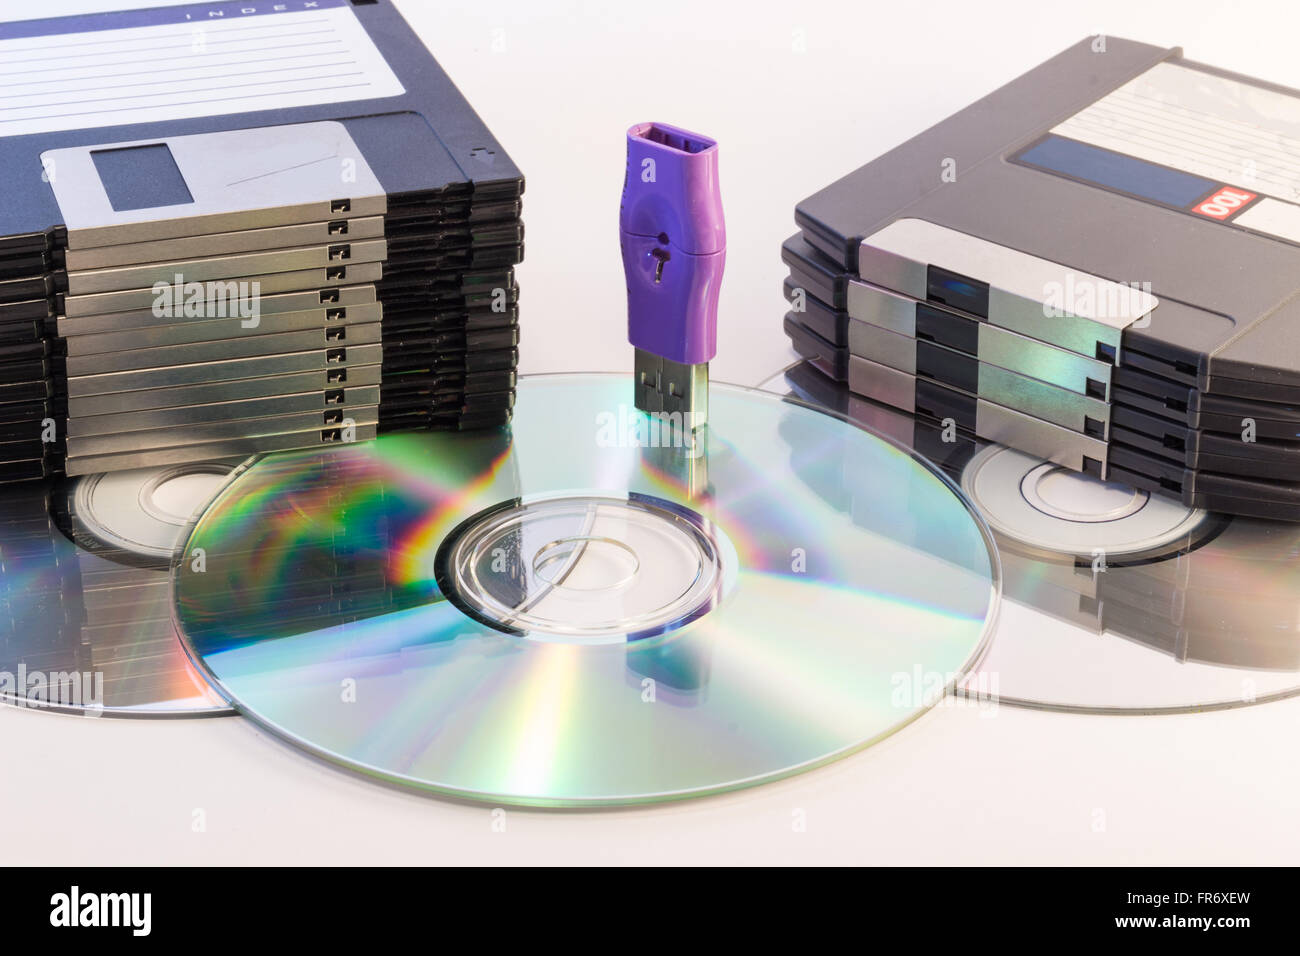 Progression of computer data storage media from floppy to USB flash stick through the DVD rom - Stock Image